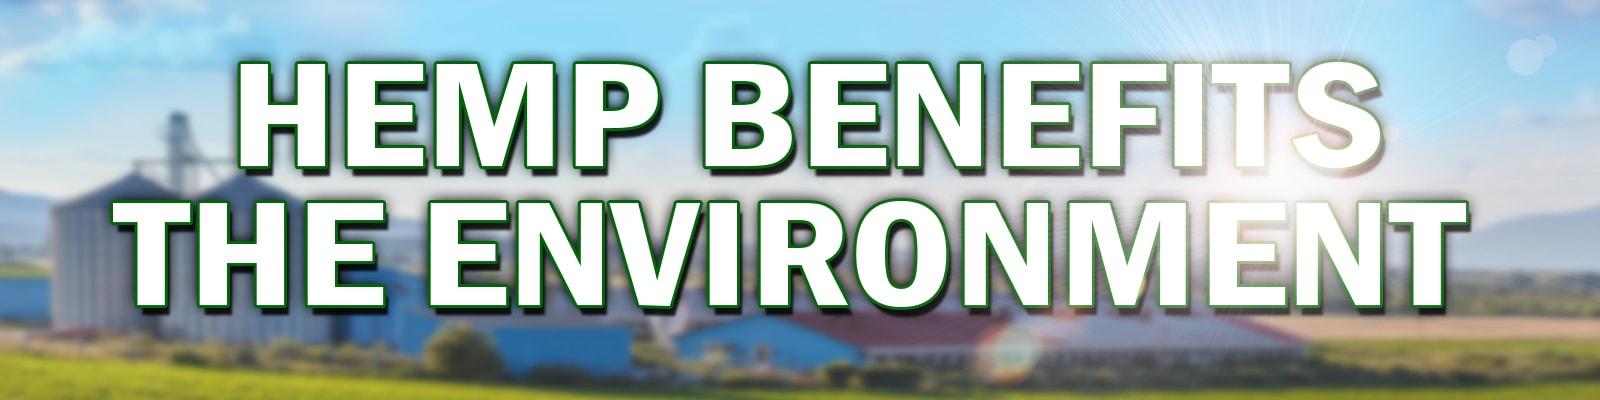 Earth Day Hemp Benefits